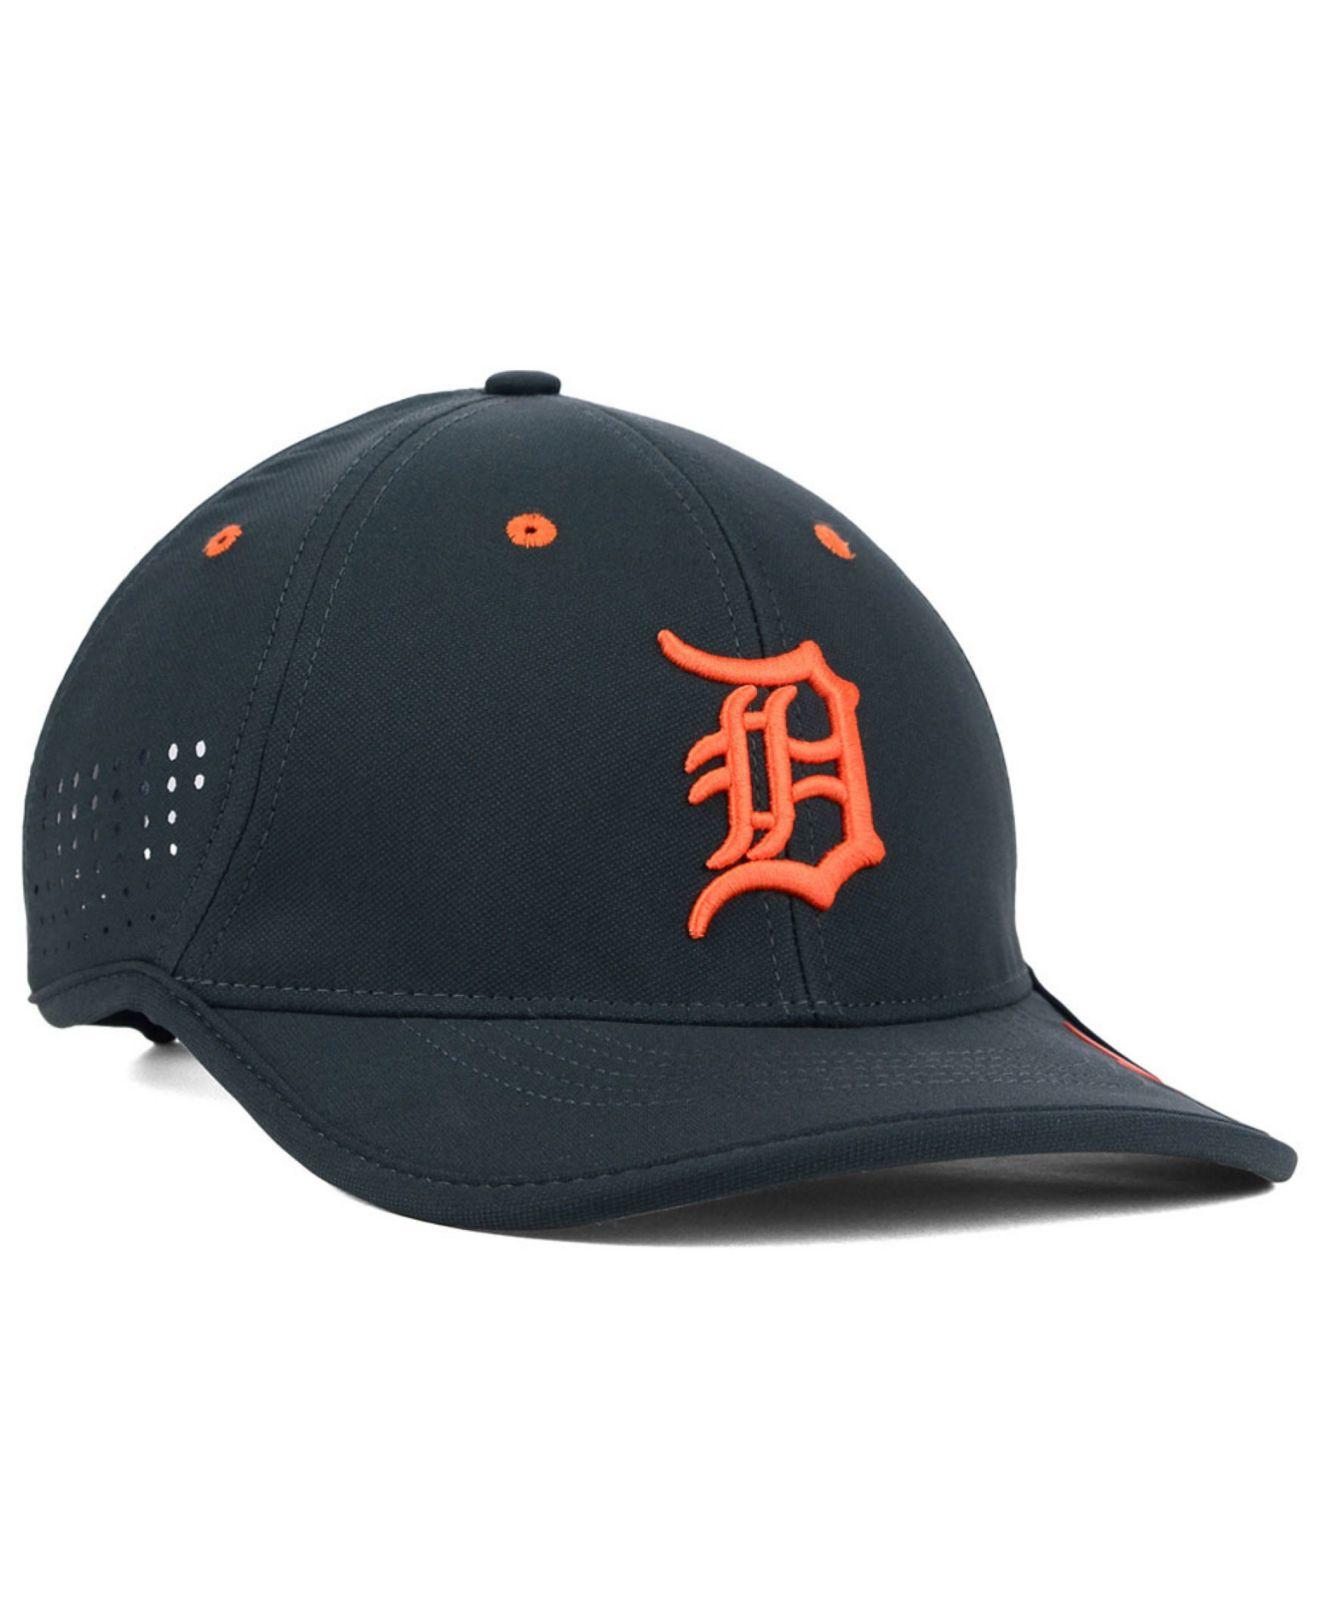 95d4b65de92 ... hat 7ad24 55dcb reduced lyst nike detroit tigers vapor swoosh  adjustable cap in gray for men 56b3b e571e ...